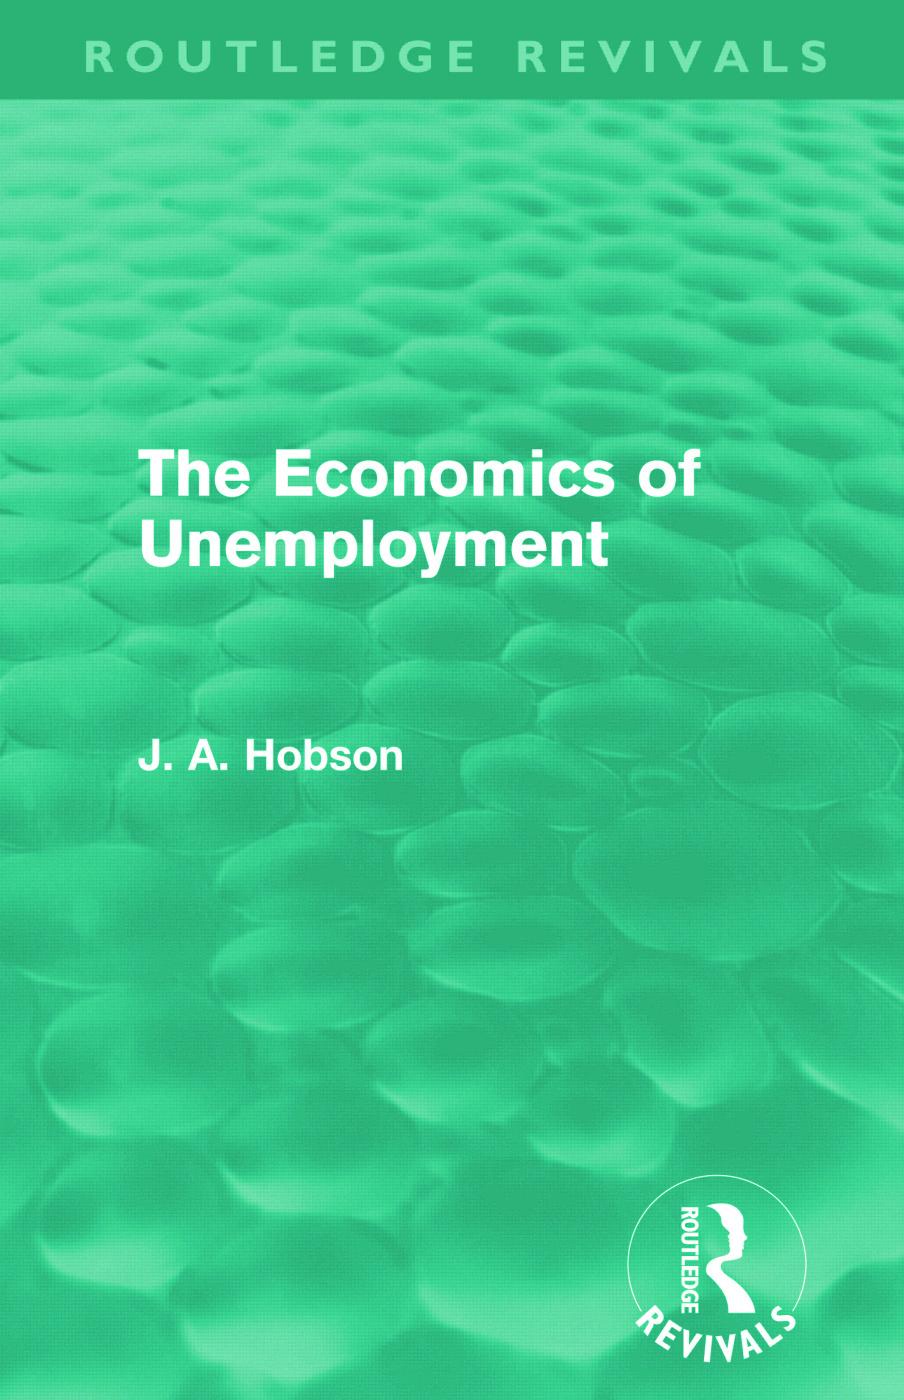 The Economics of Unemployment (Routledge Revivals) (Paperback) book cover